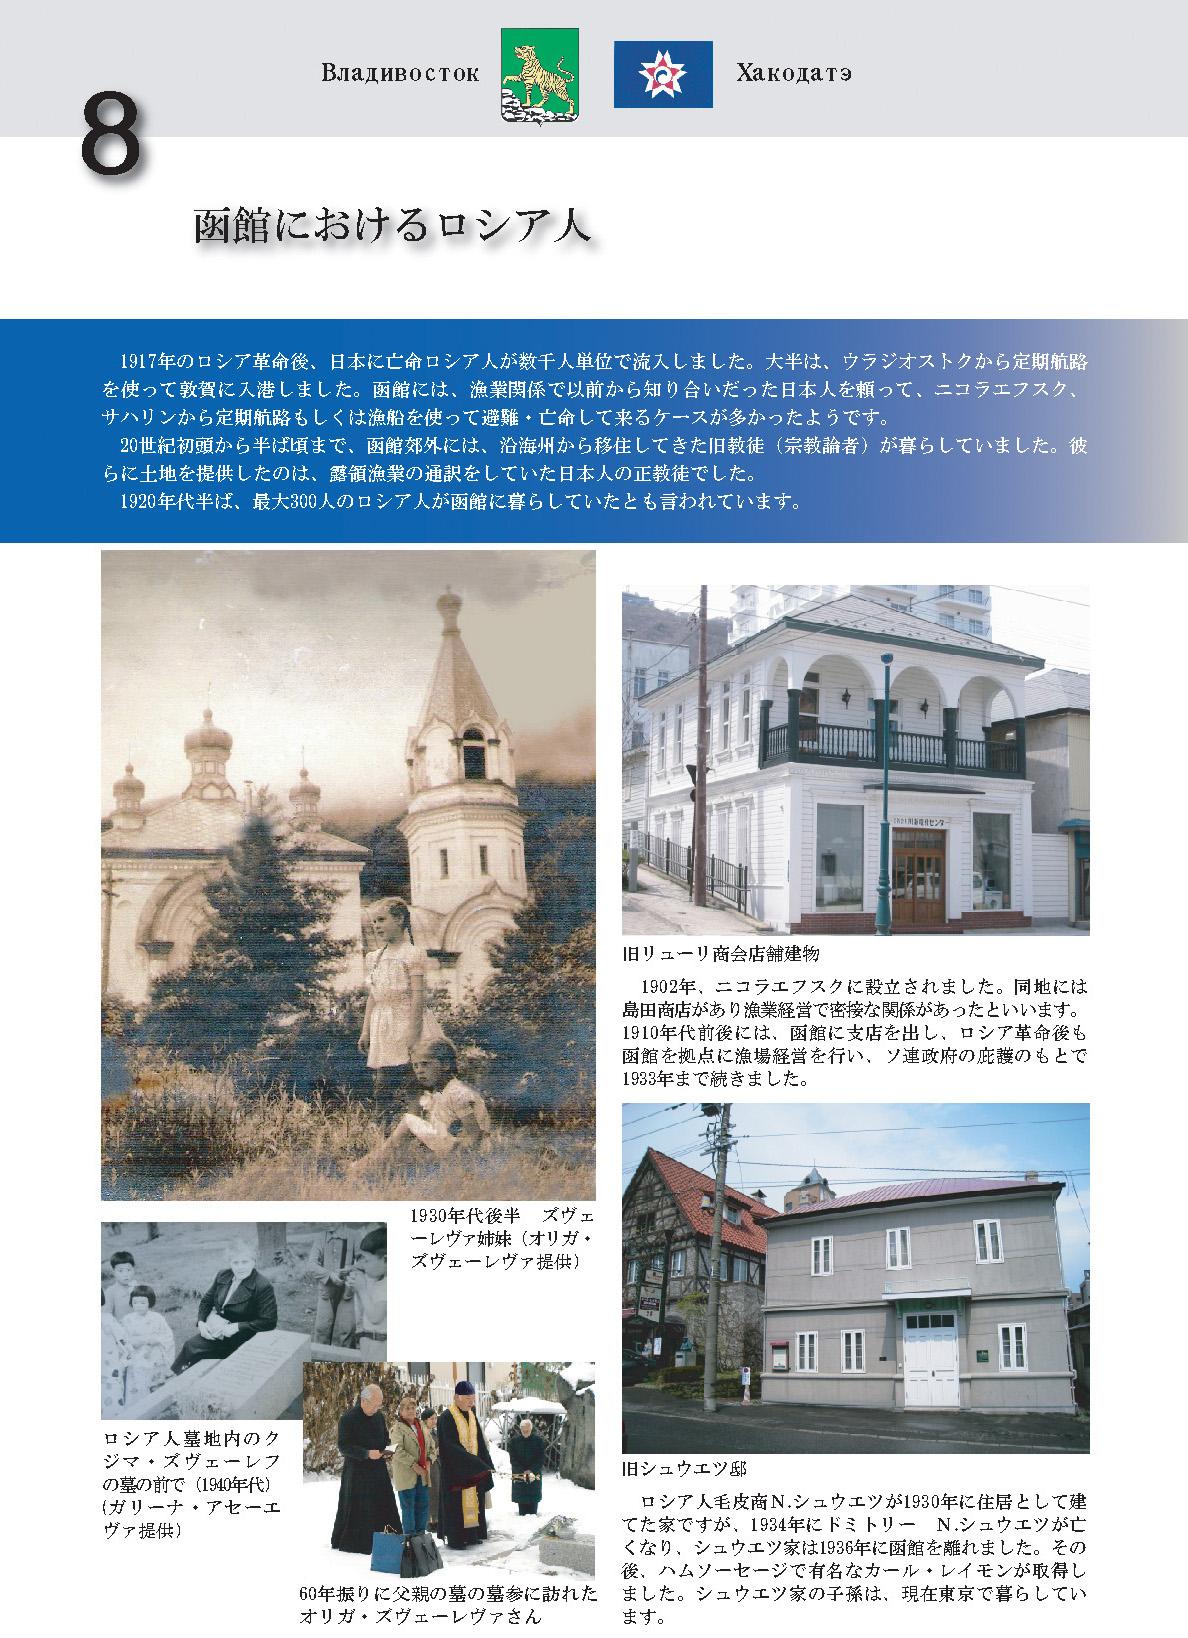 http://hakodate-russia.com/main/image/2011-11.jpg